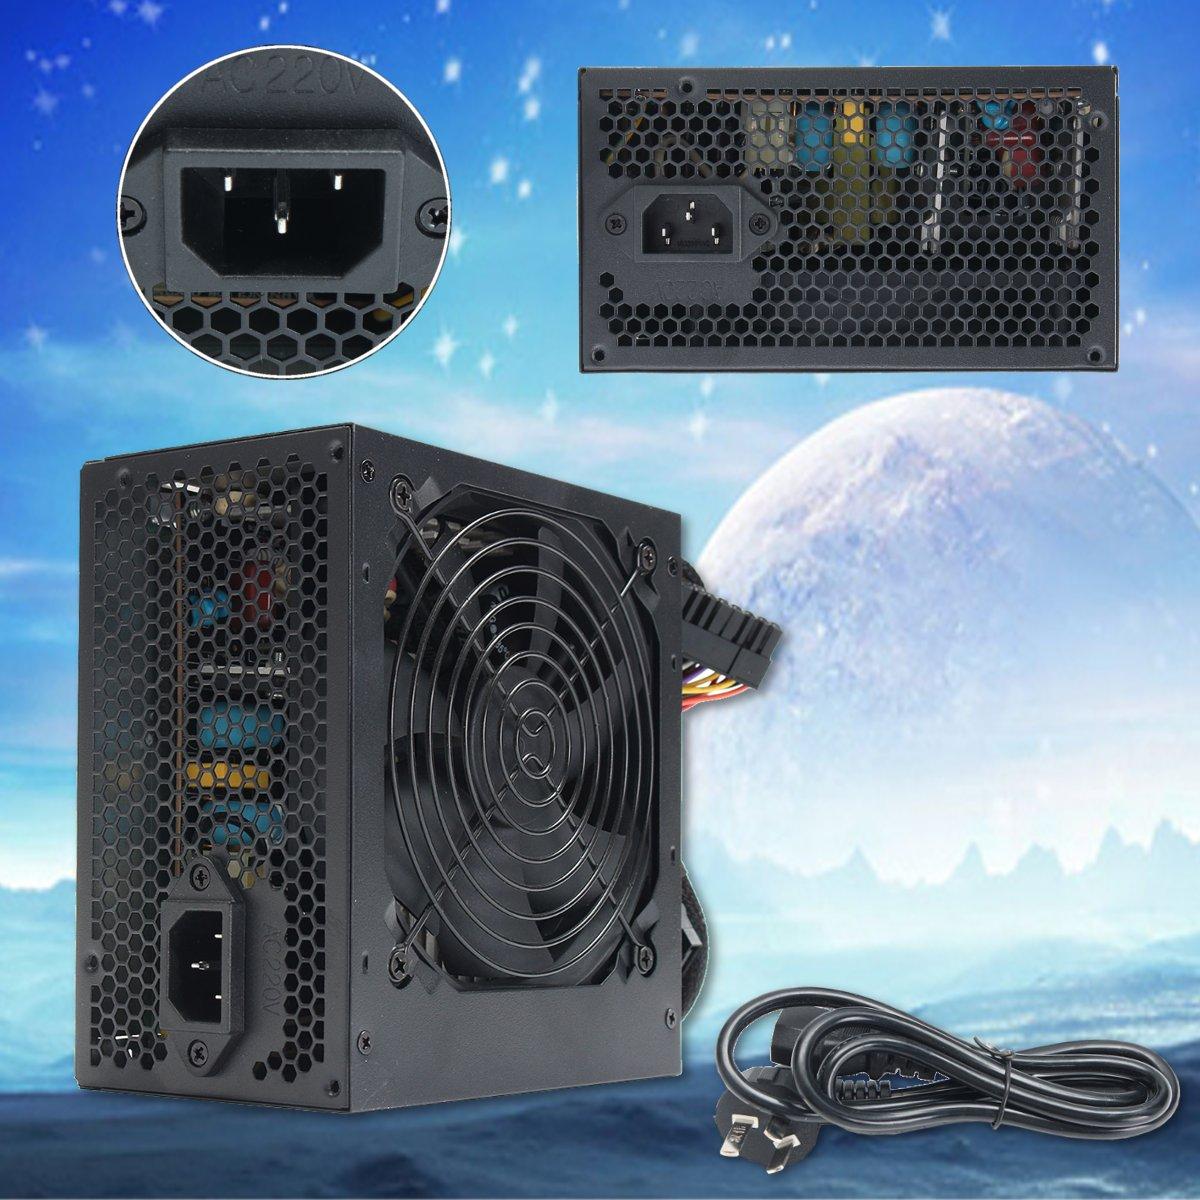 350W 650W Peak- PSU ATX 12V Gaming PC Power Supply 24Pin / Molex / Sata 12CM Fan Computer Power Supply For BTC